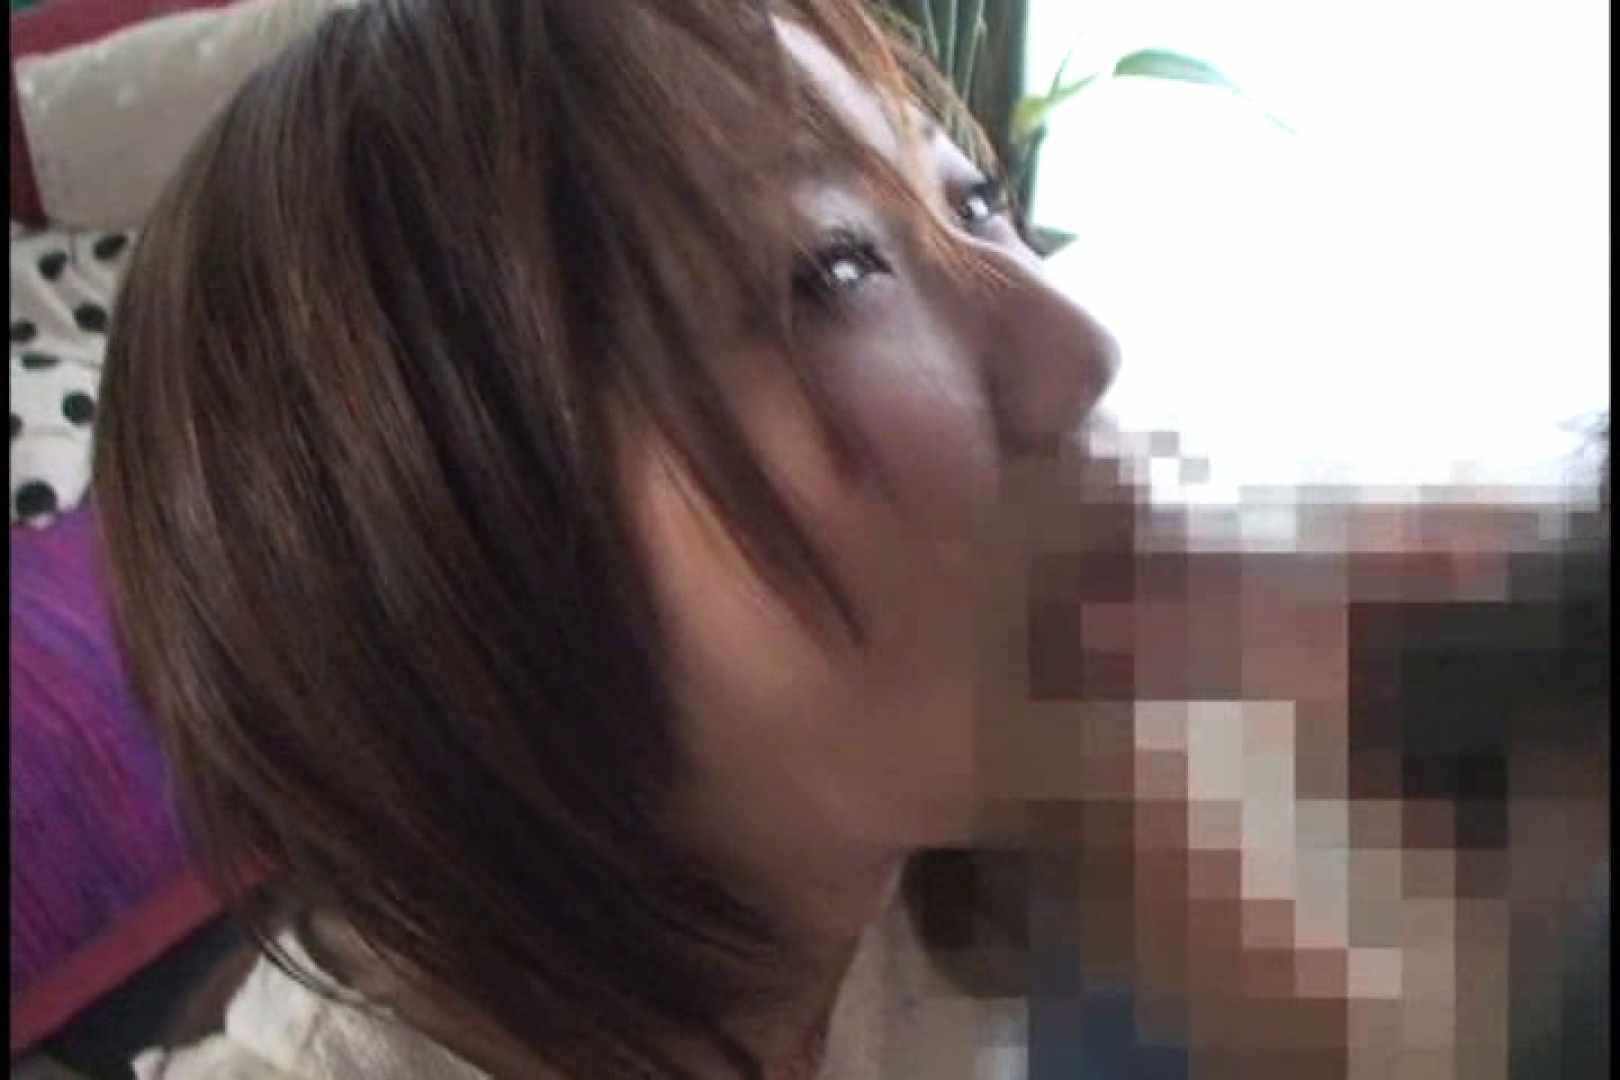 JDハンター全国ツアー vol.043 後編 女子大生のエロ動画  88PIX 40